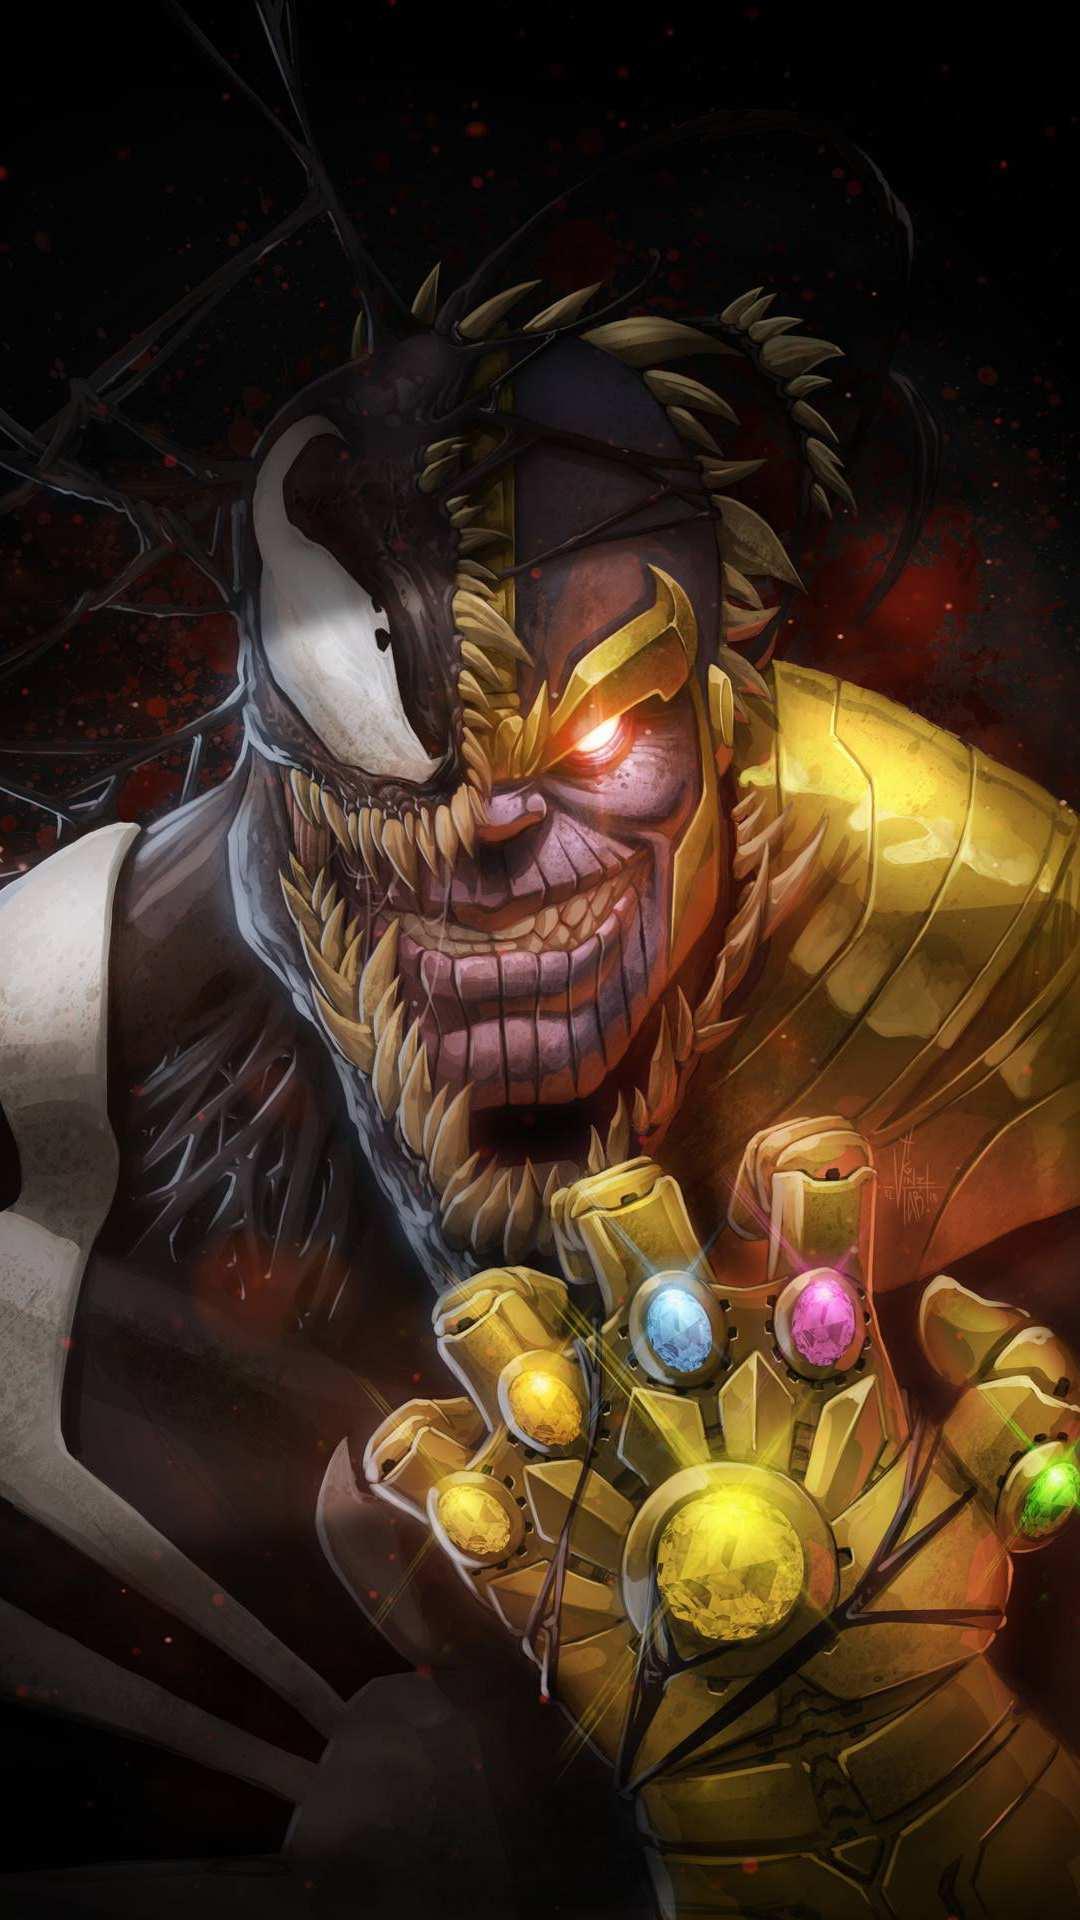 The Avegners Wallpaper Quotes Thanos Vs Venom Iphone Wallpaper Iphone Wallpapers